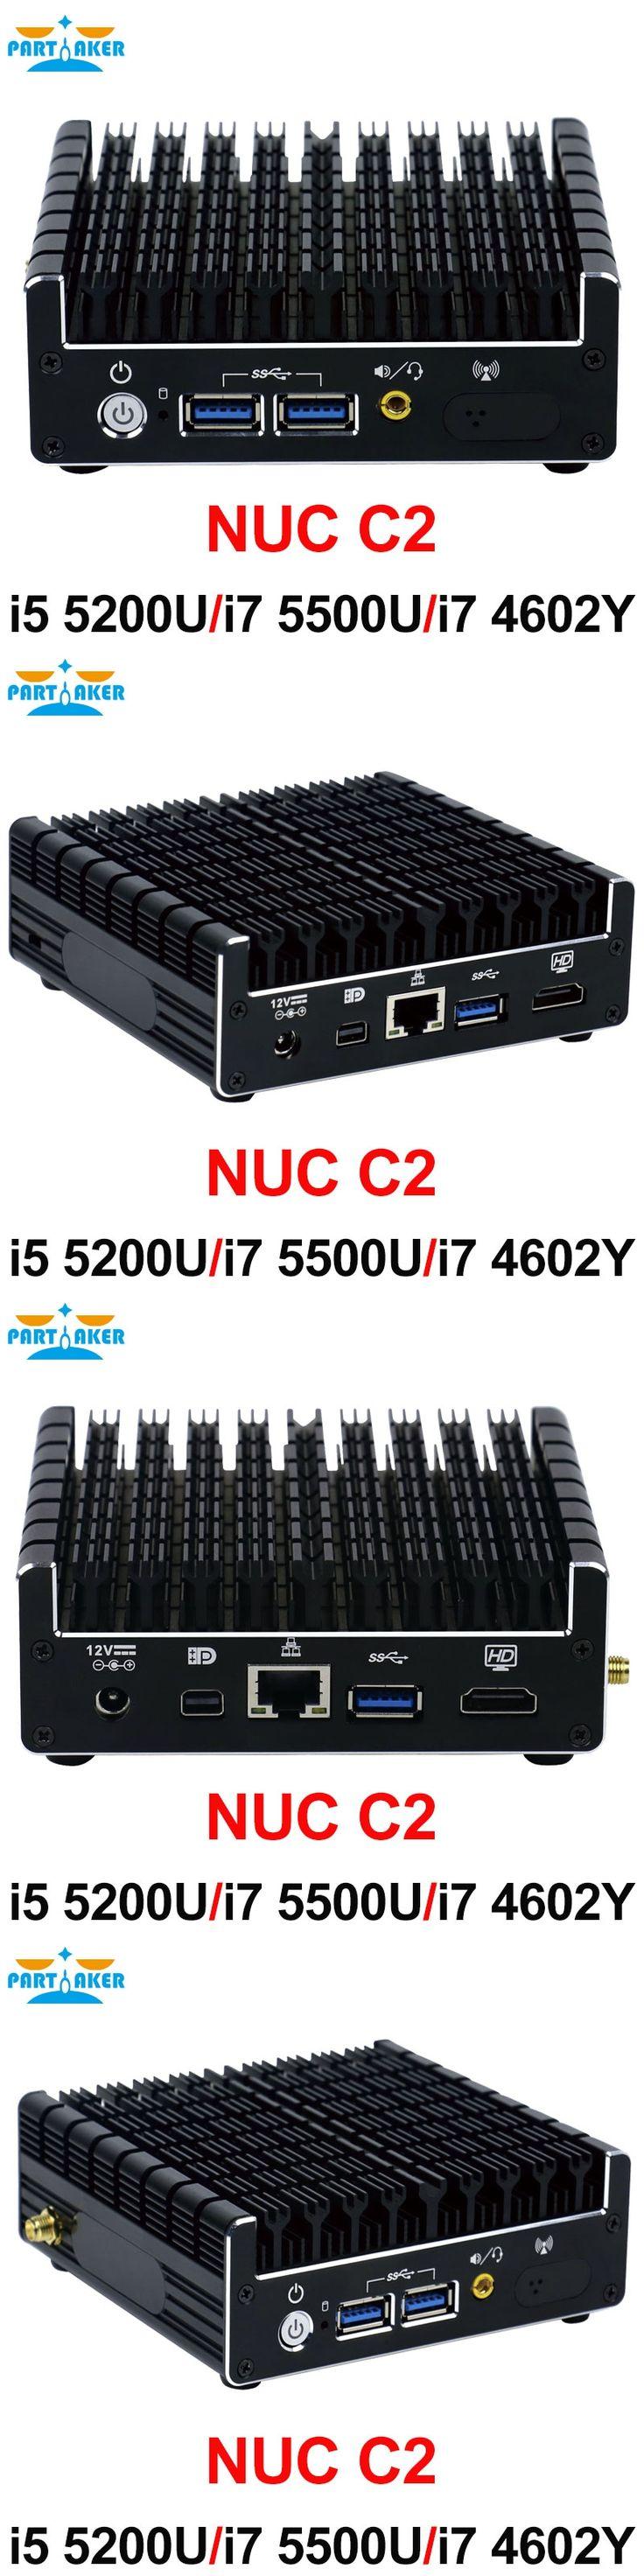 Partaker NUC Mini PC Fanless Mini PC I5-5200U I5 5300U I7 5550U with 1*Mini DP HDMI LAN